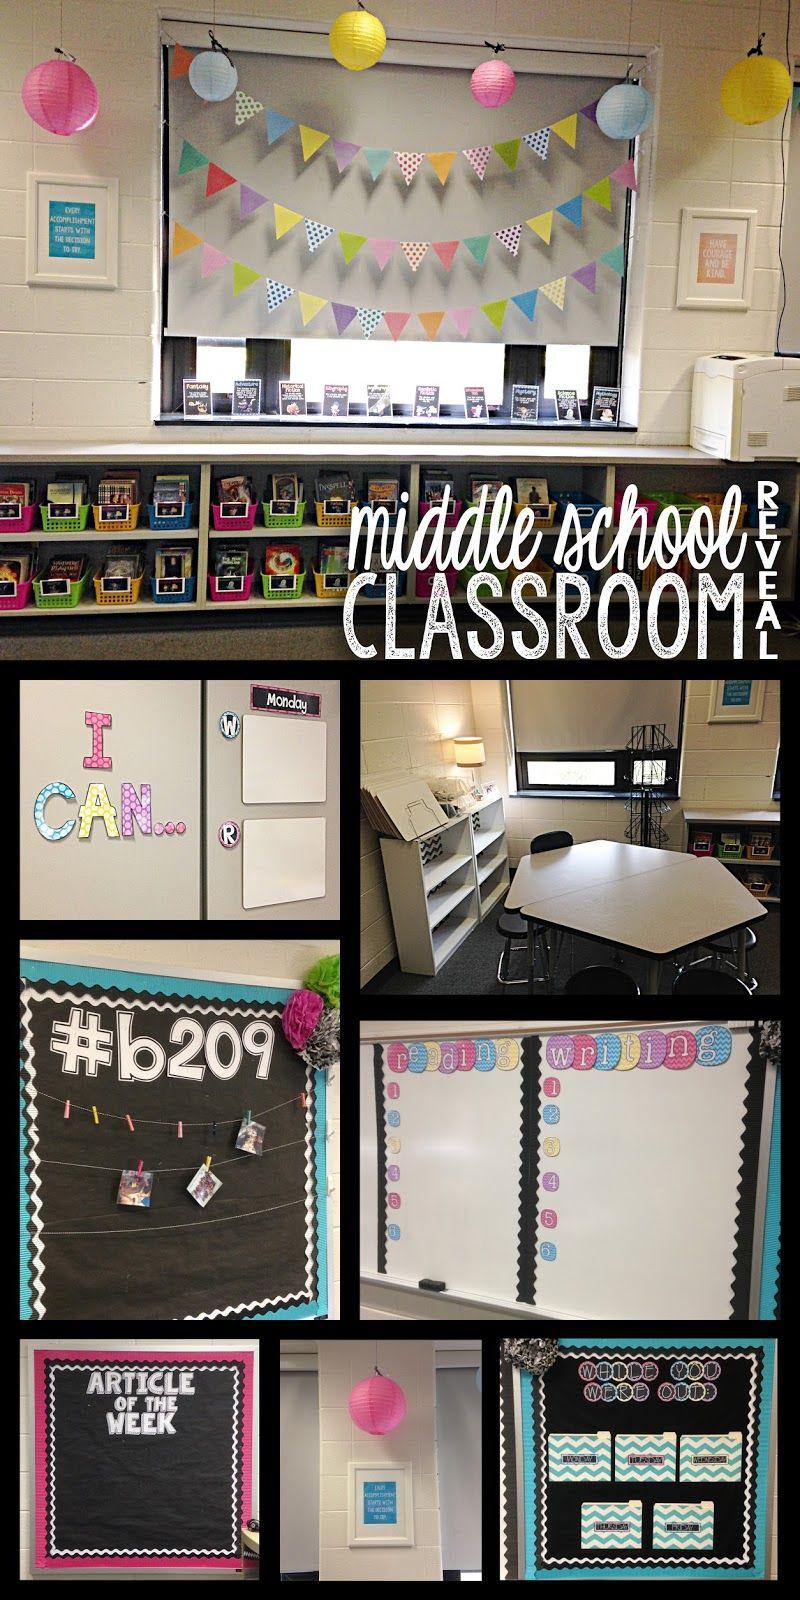 7th Grade Math Classroom Decorations ~ Classroom reveal teaching ideas ️ pinterest